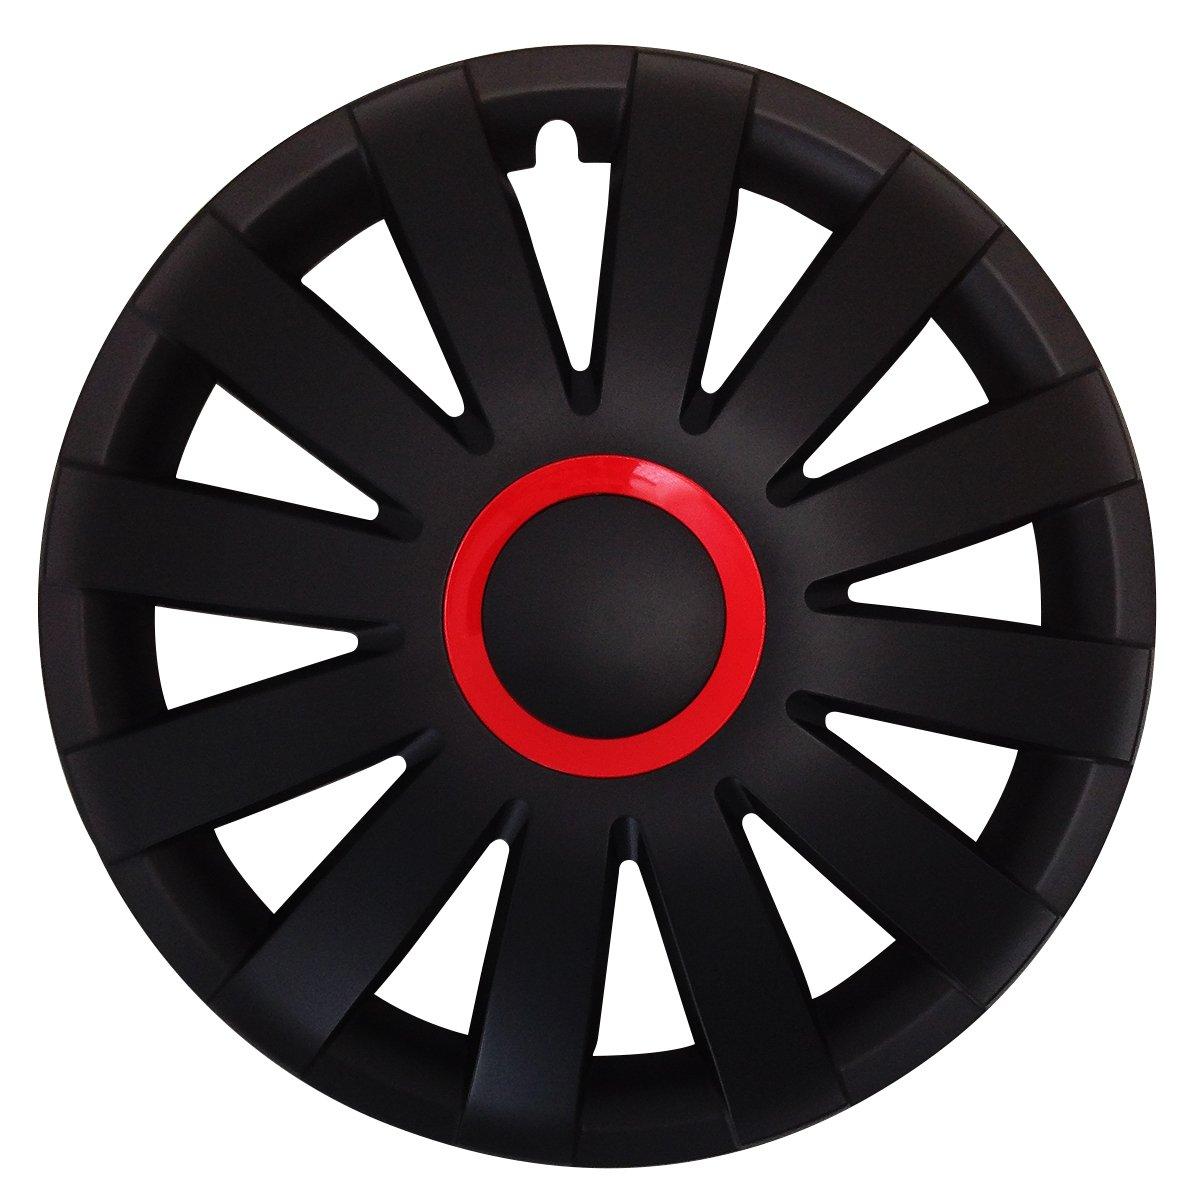 15 Zoll Radkappen AGAT passend f/ür fast alle Fahrzeugtypen Farbe /& Gr/ö/ße w/ählbar! Gr/ün universal